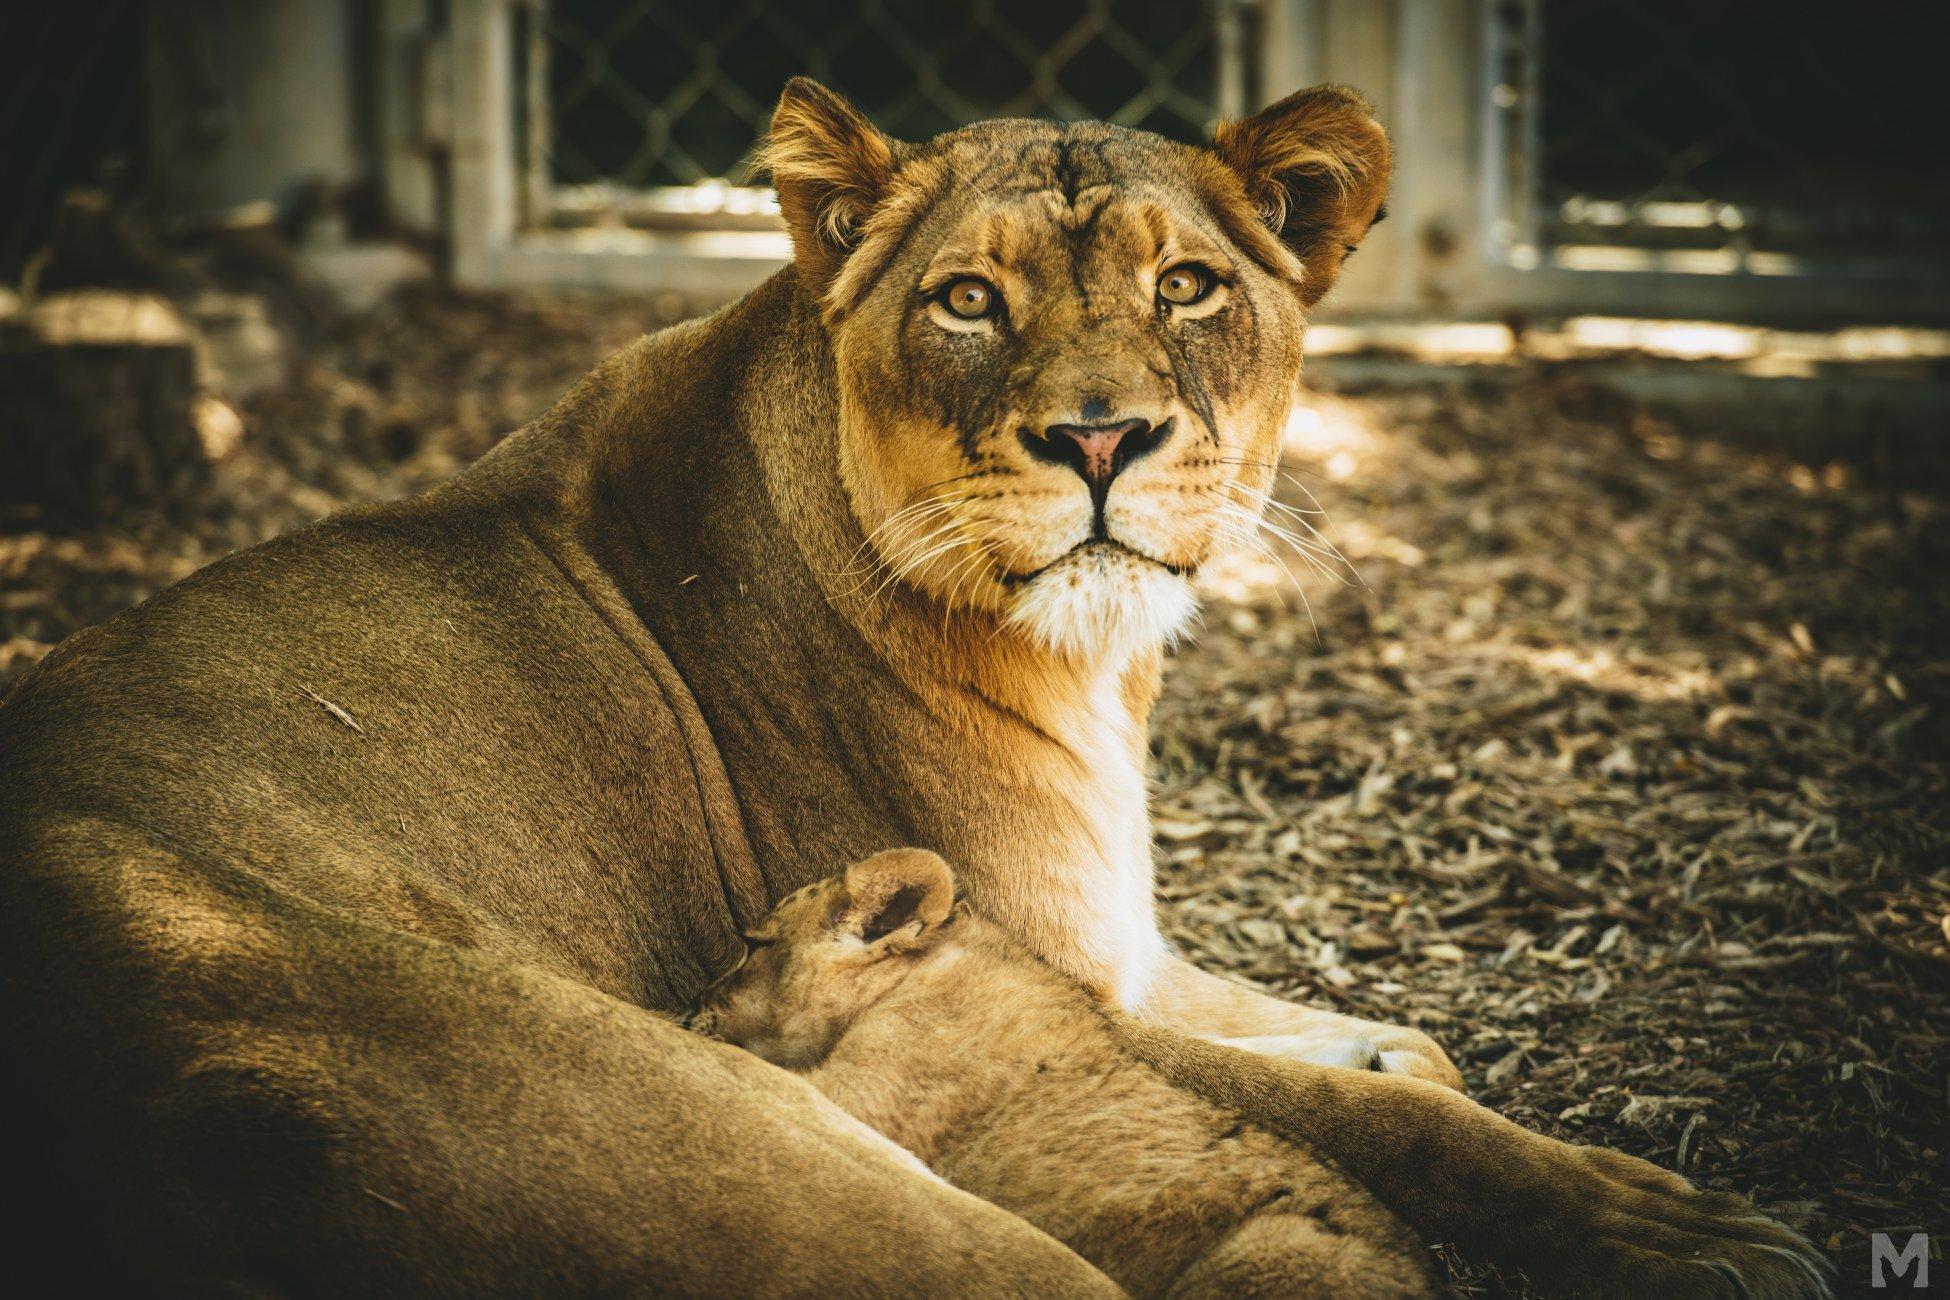 Lion Cub_14_Molly McCormick.jpg